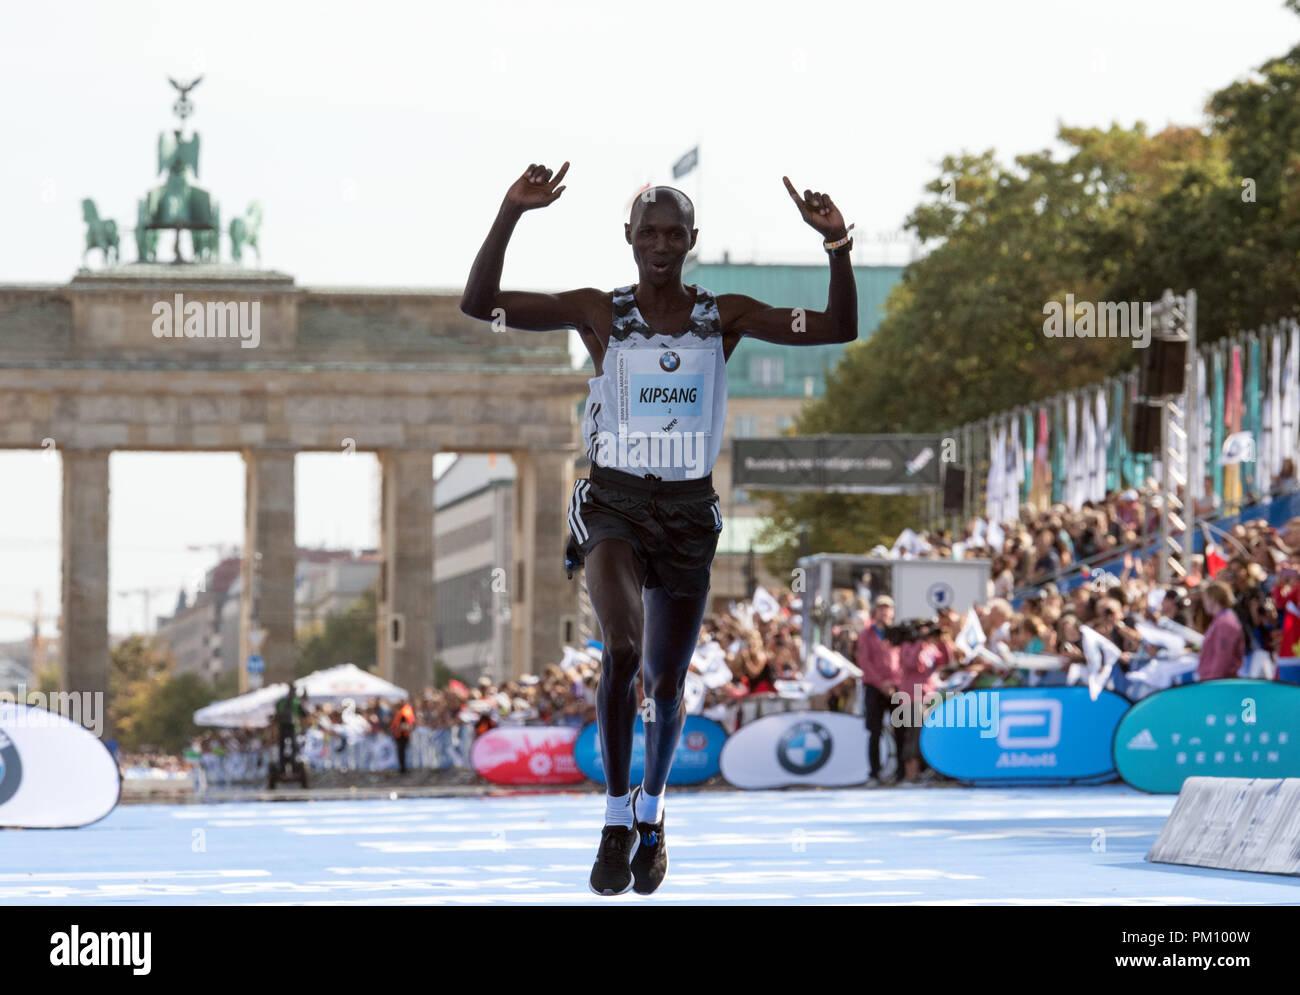 Berlin, Germany. 16 September 2018, Berlin: Wilson Kipsang finishing third the 45th BMW Berlin Marathon. Photo: Soeren Stache/dpa Credit: dpa picture alliance/Alamy Live News - Stock Image